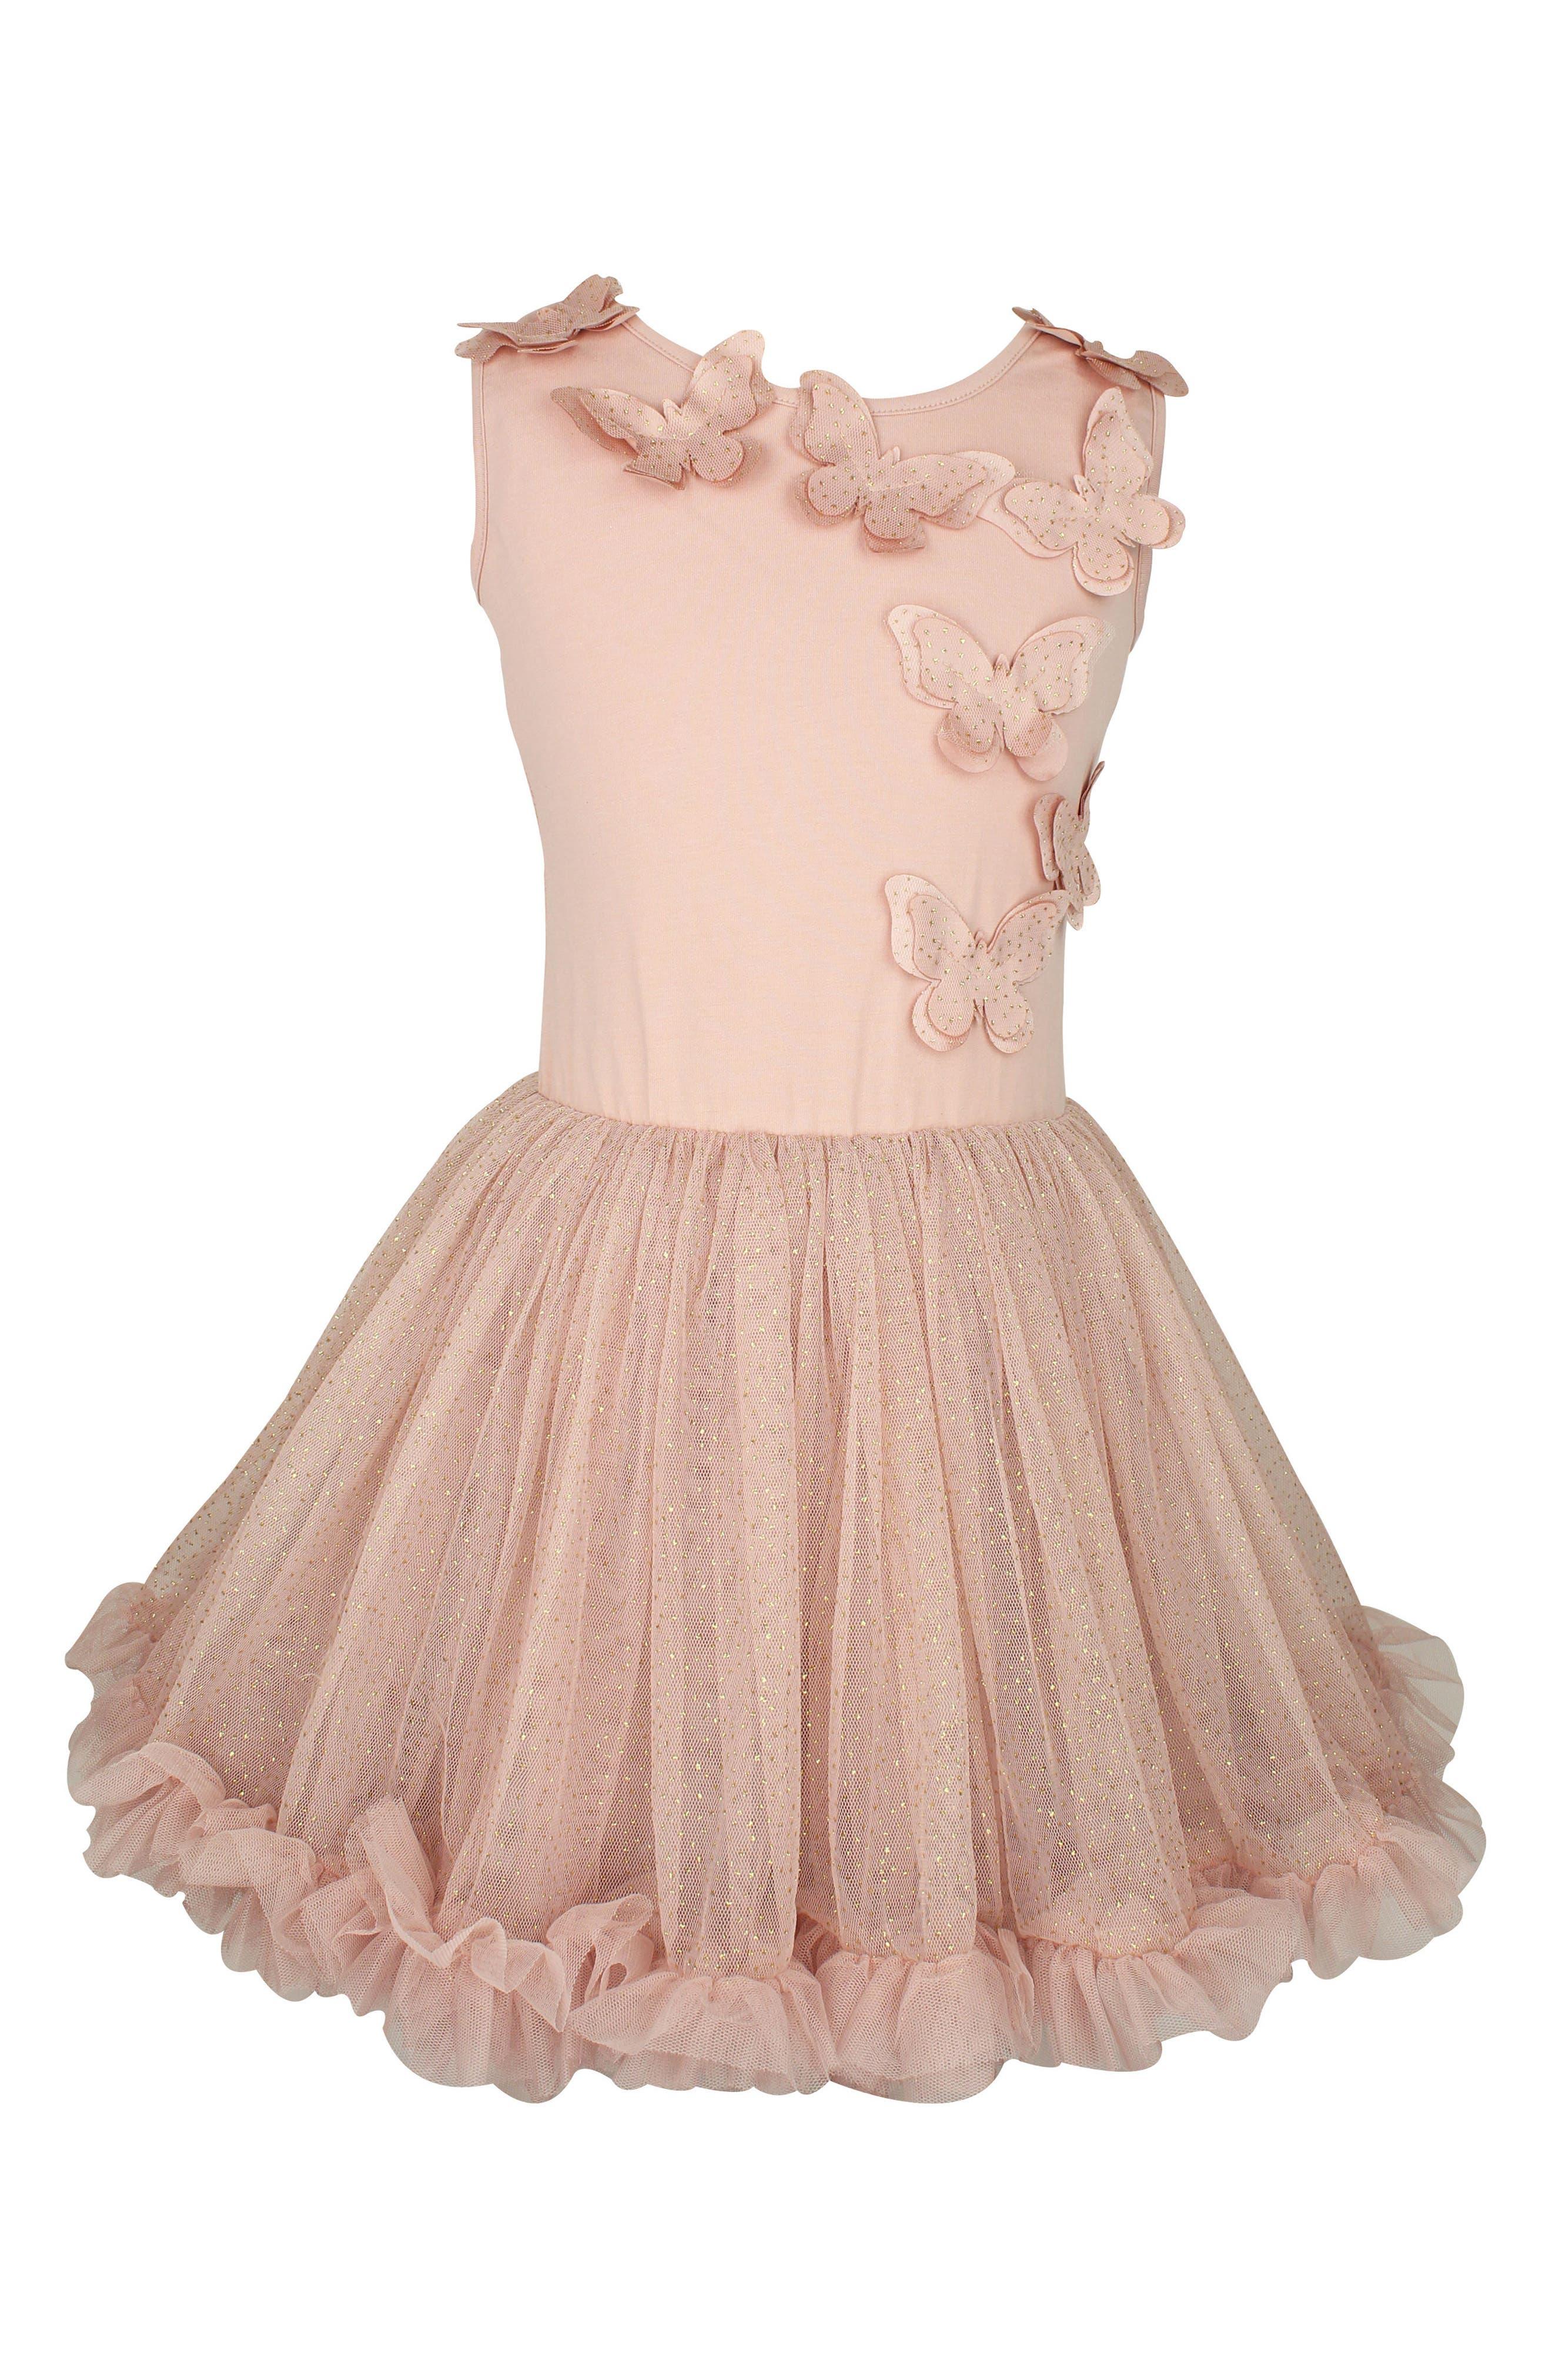 POPATU, Butterfly Dress, Main thumbnail 1, color, 650